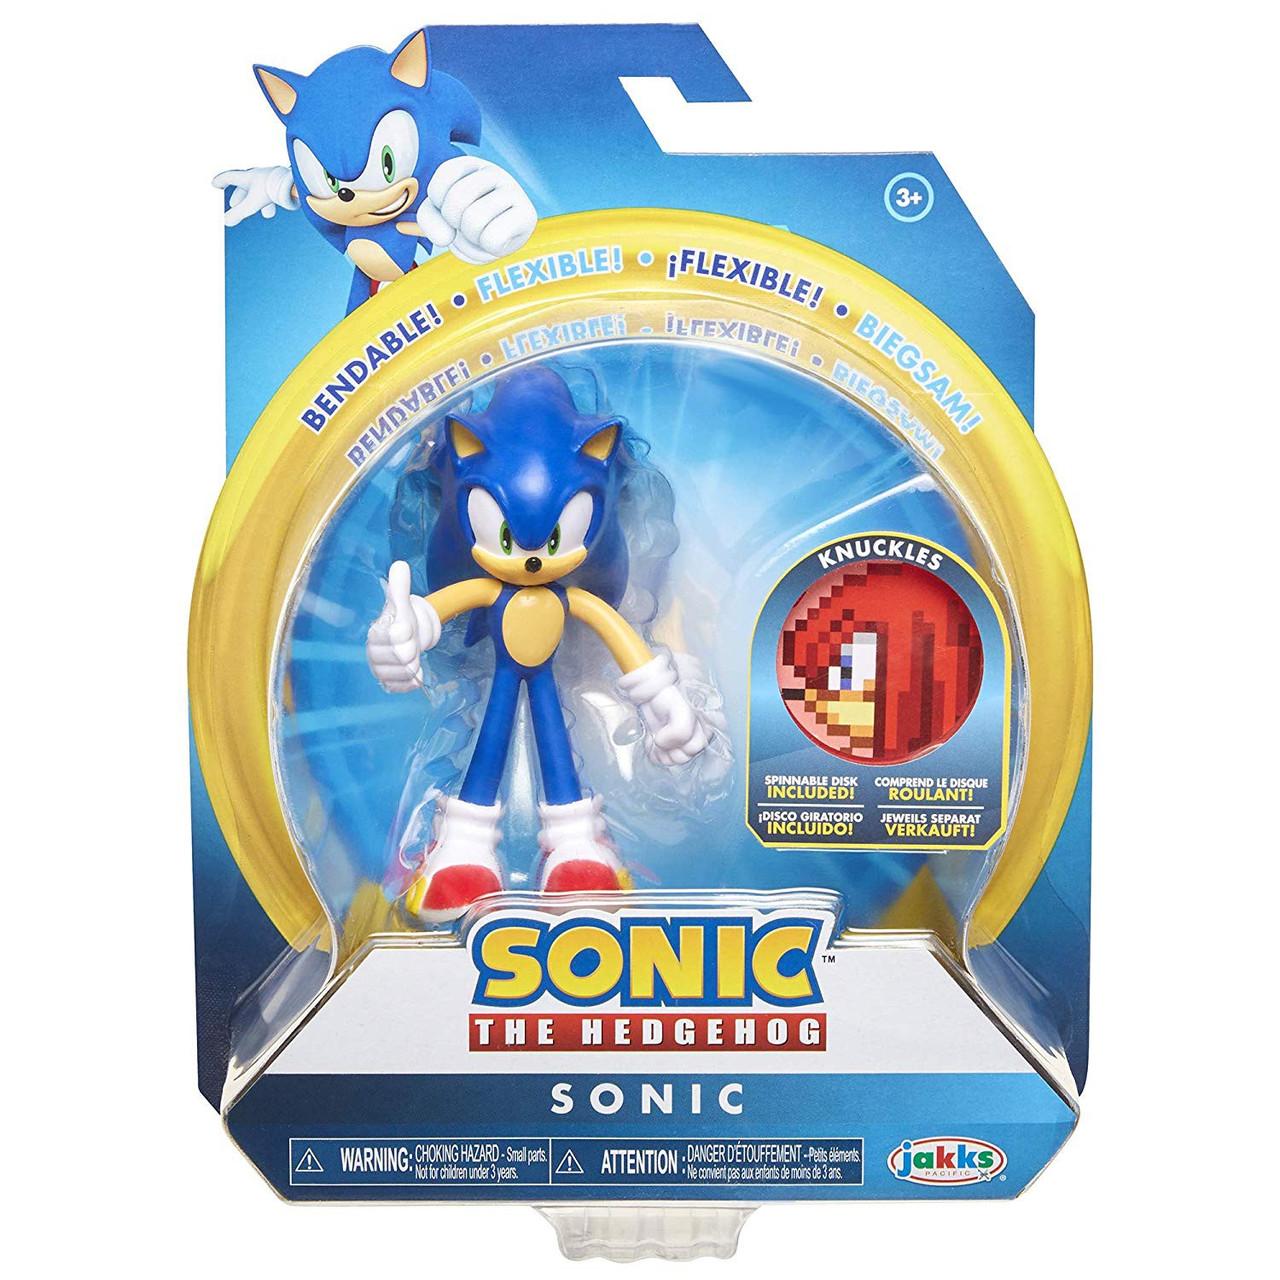 Sonic The Hedgehog 2020 Series 1 Sonic 4 Action Figure Knuckles Spinnable Disk Jakks Pacific Toywiz